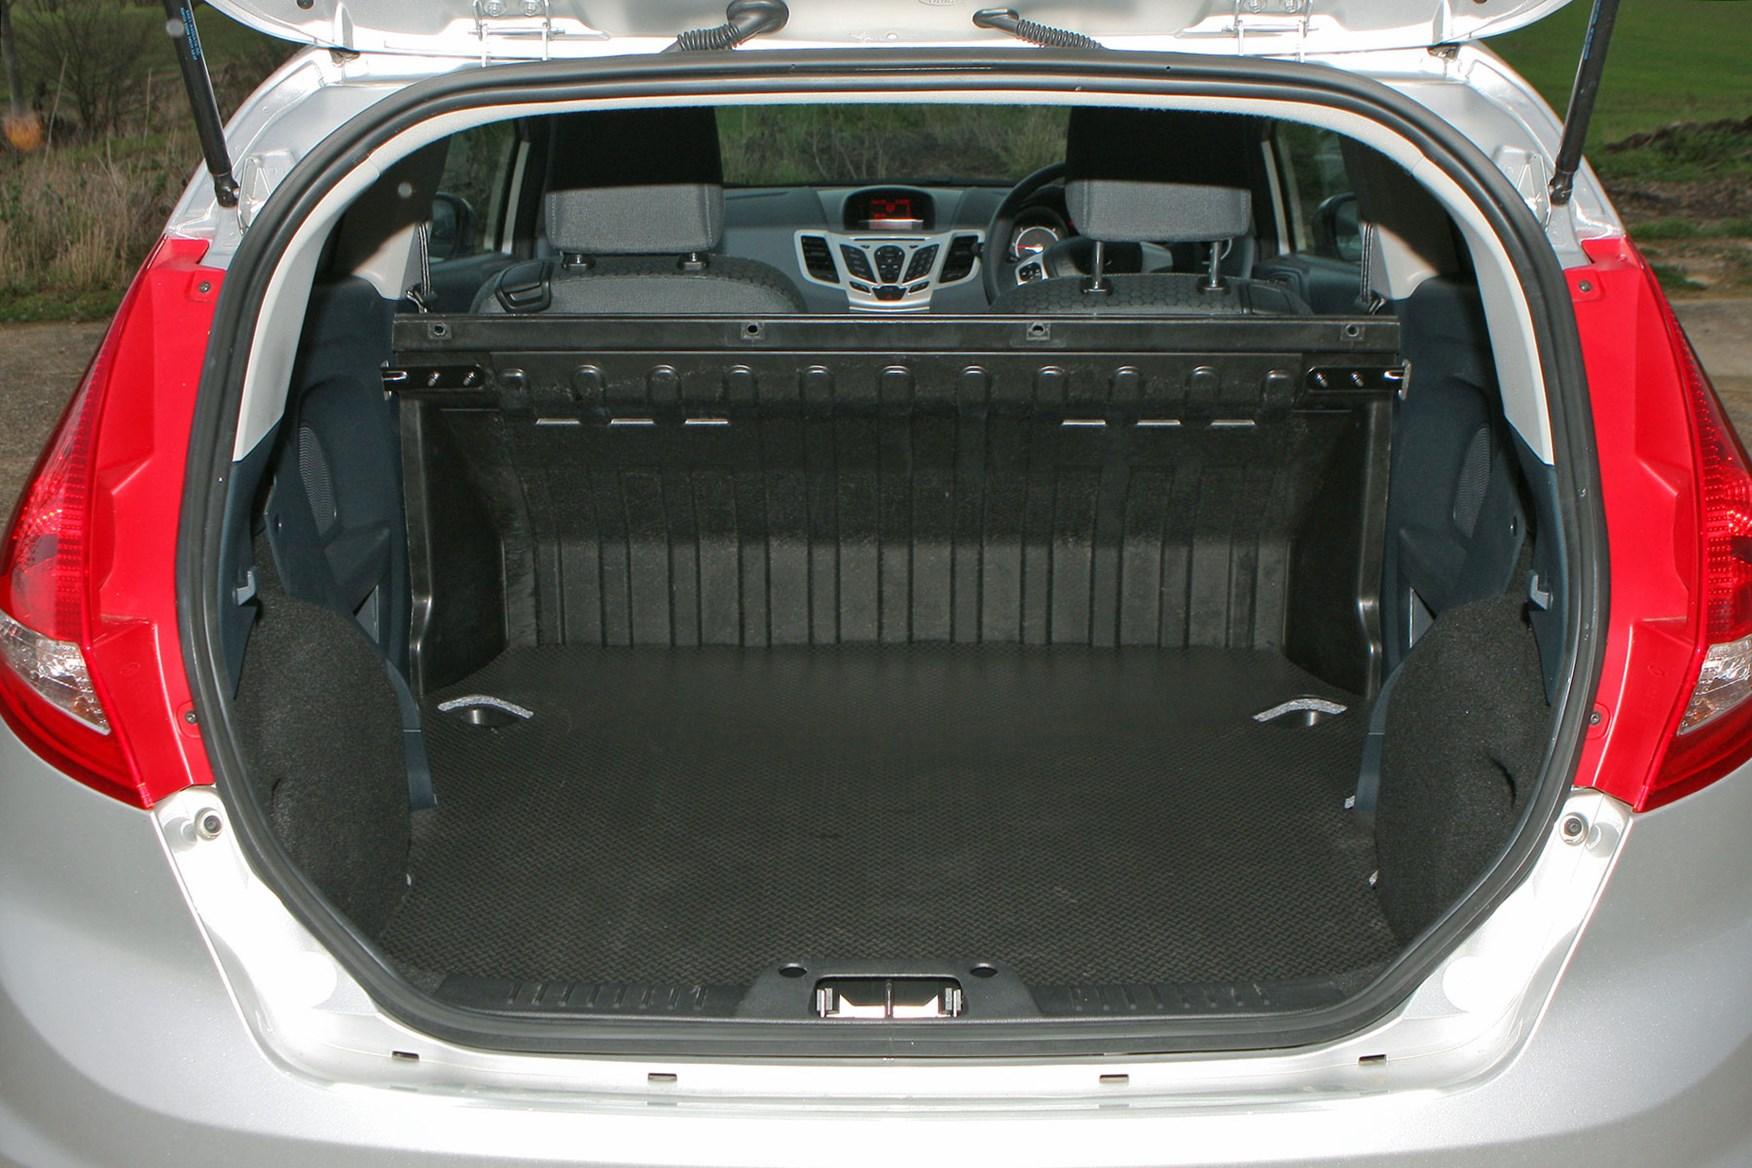 Ford Fiesta Van (2009-2017) load area dimensions